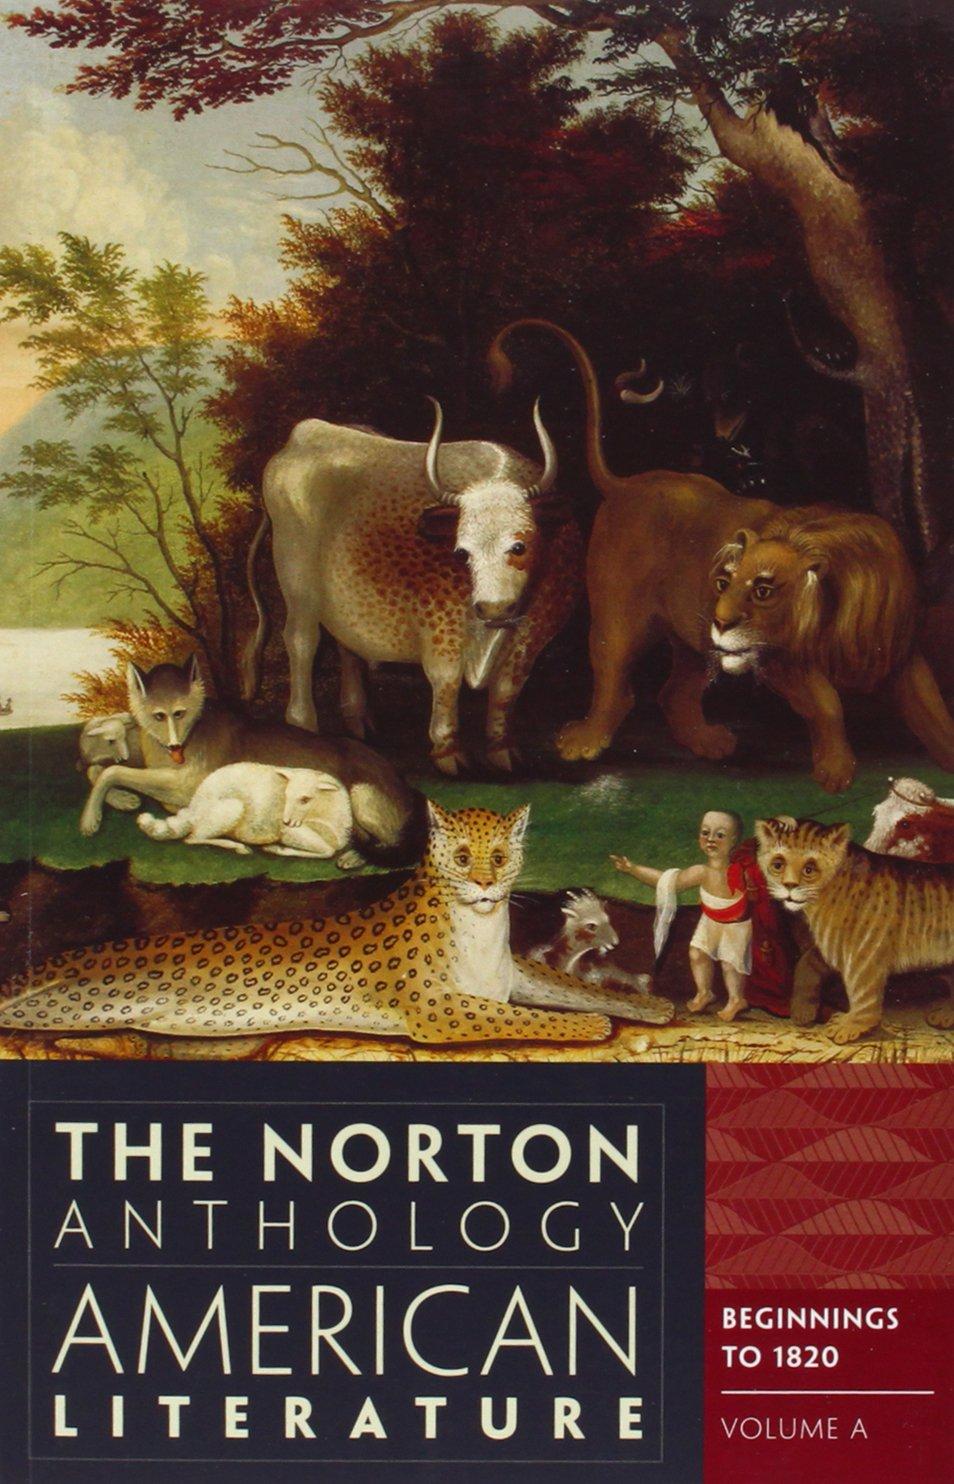 The Norton Anthology of American Literature: Amazon.es: Nina Baym, Robert S. Levine, Phillip F. Gura, Jerome Klinkowitz, Wayne Franklin, Arnold Krupat, ...